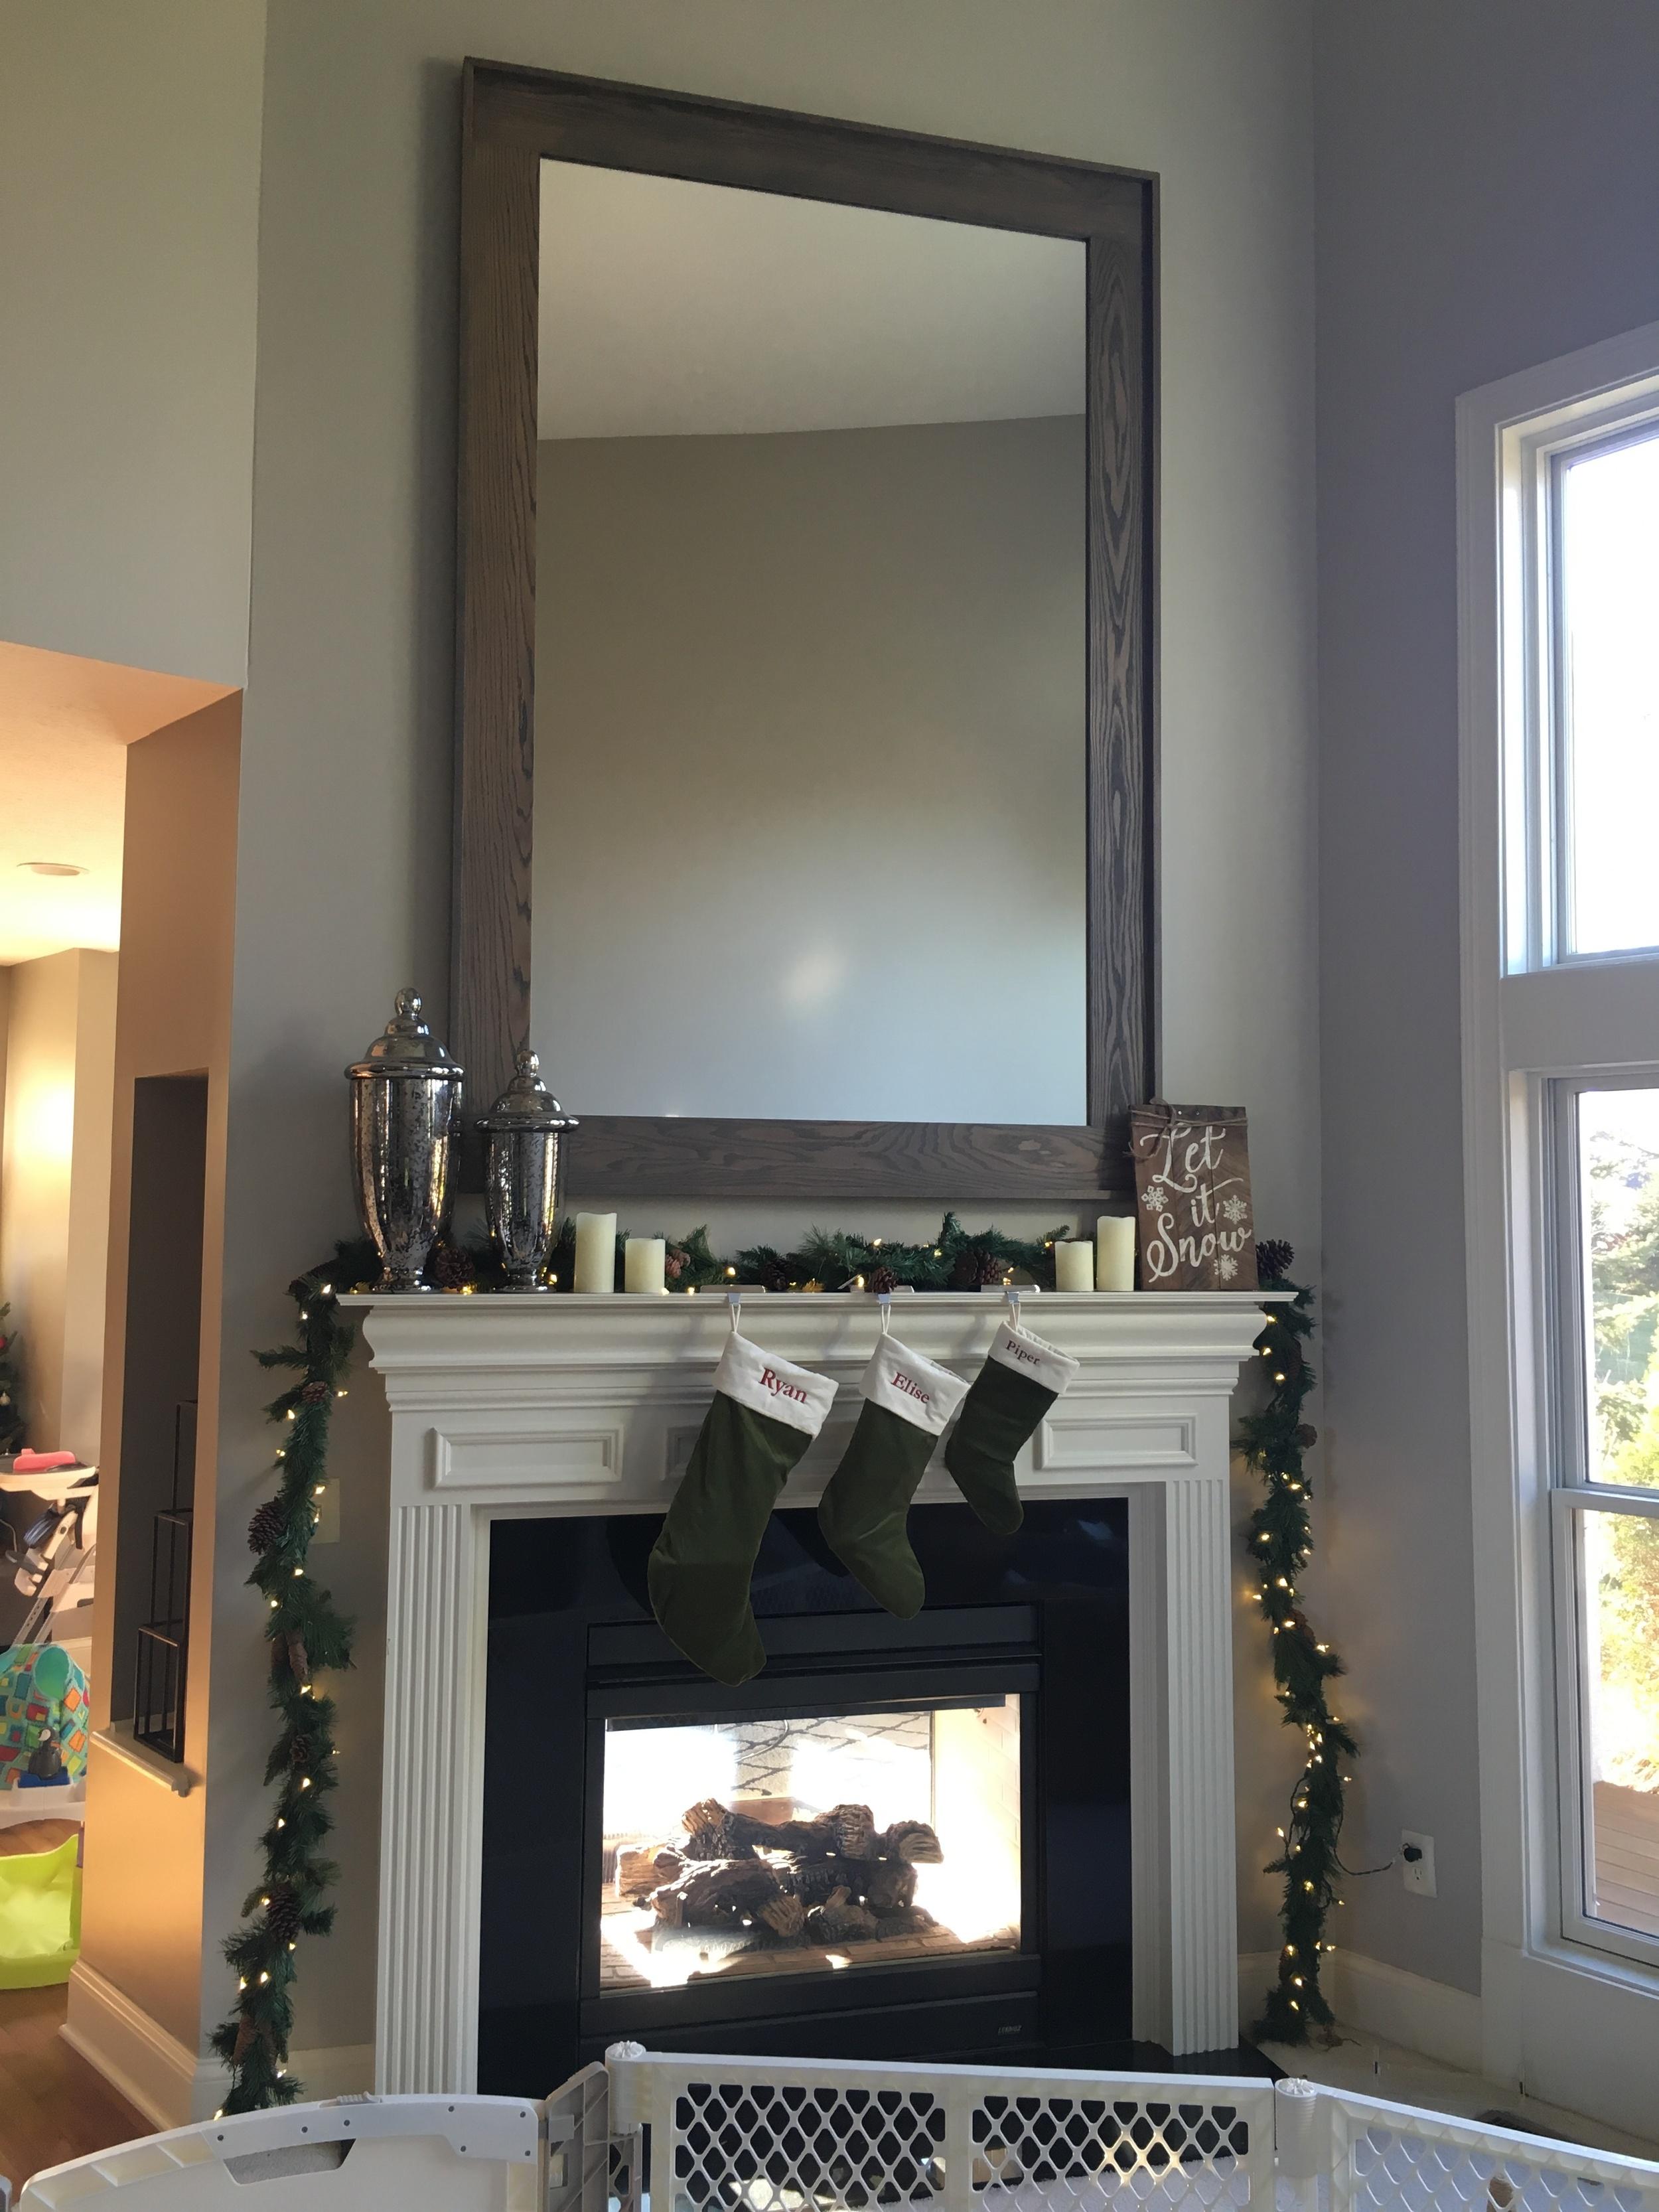 7'x5' Weathered Oak framed mirror